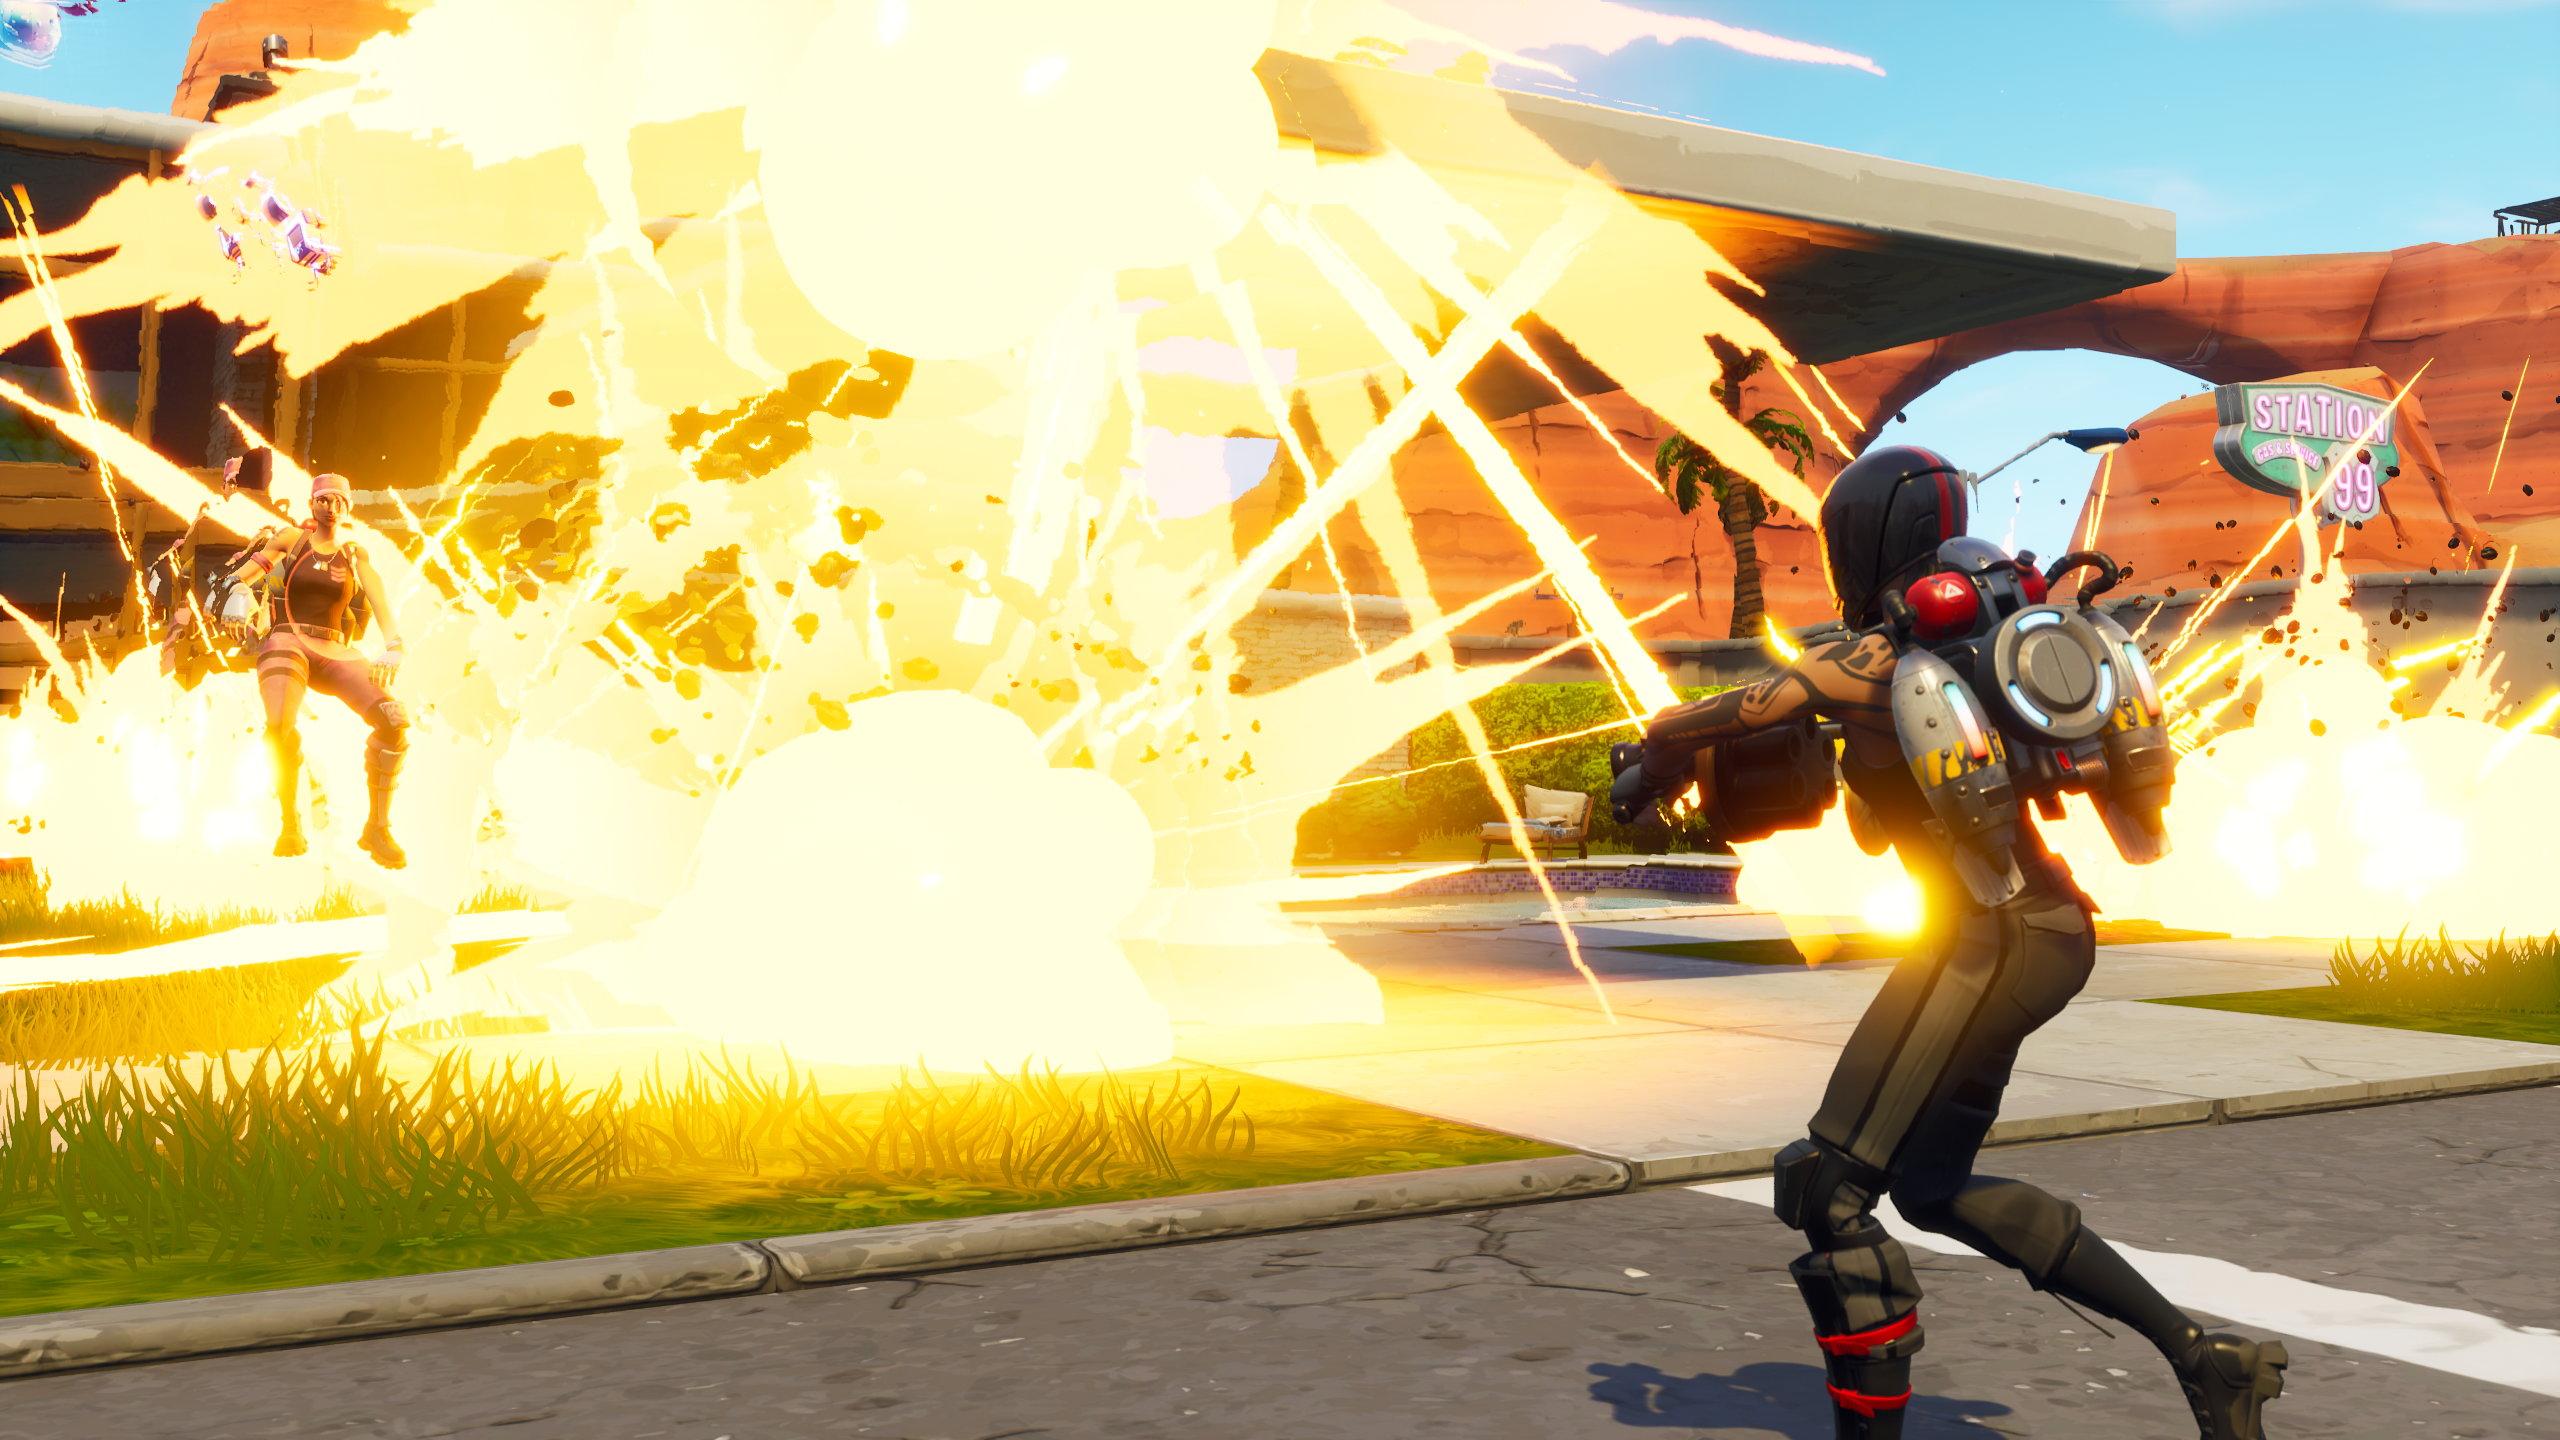 Fortnite - Explosions